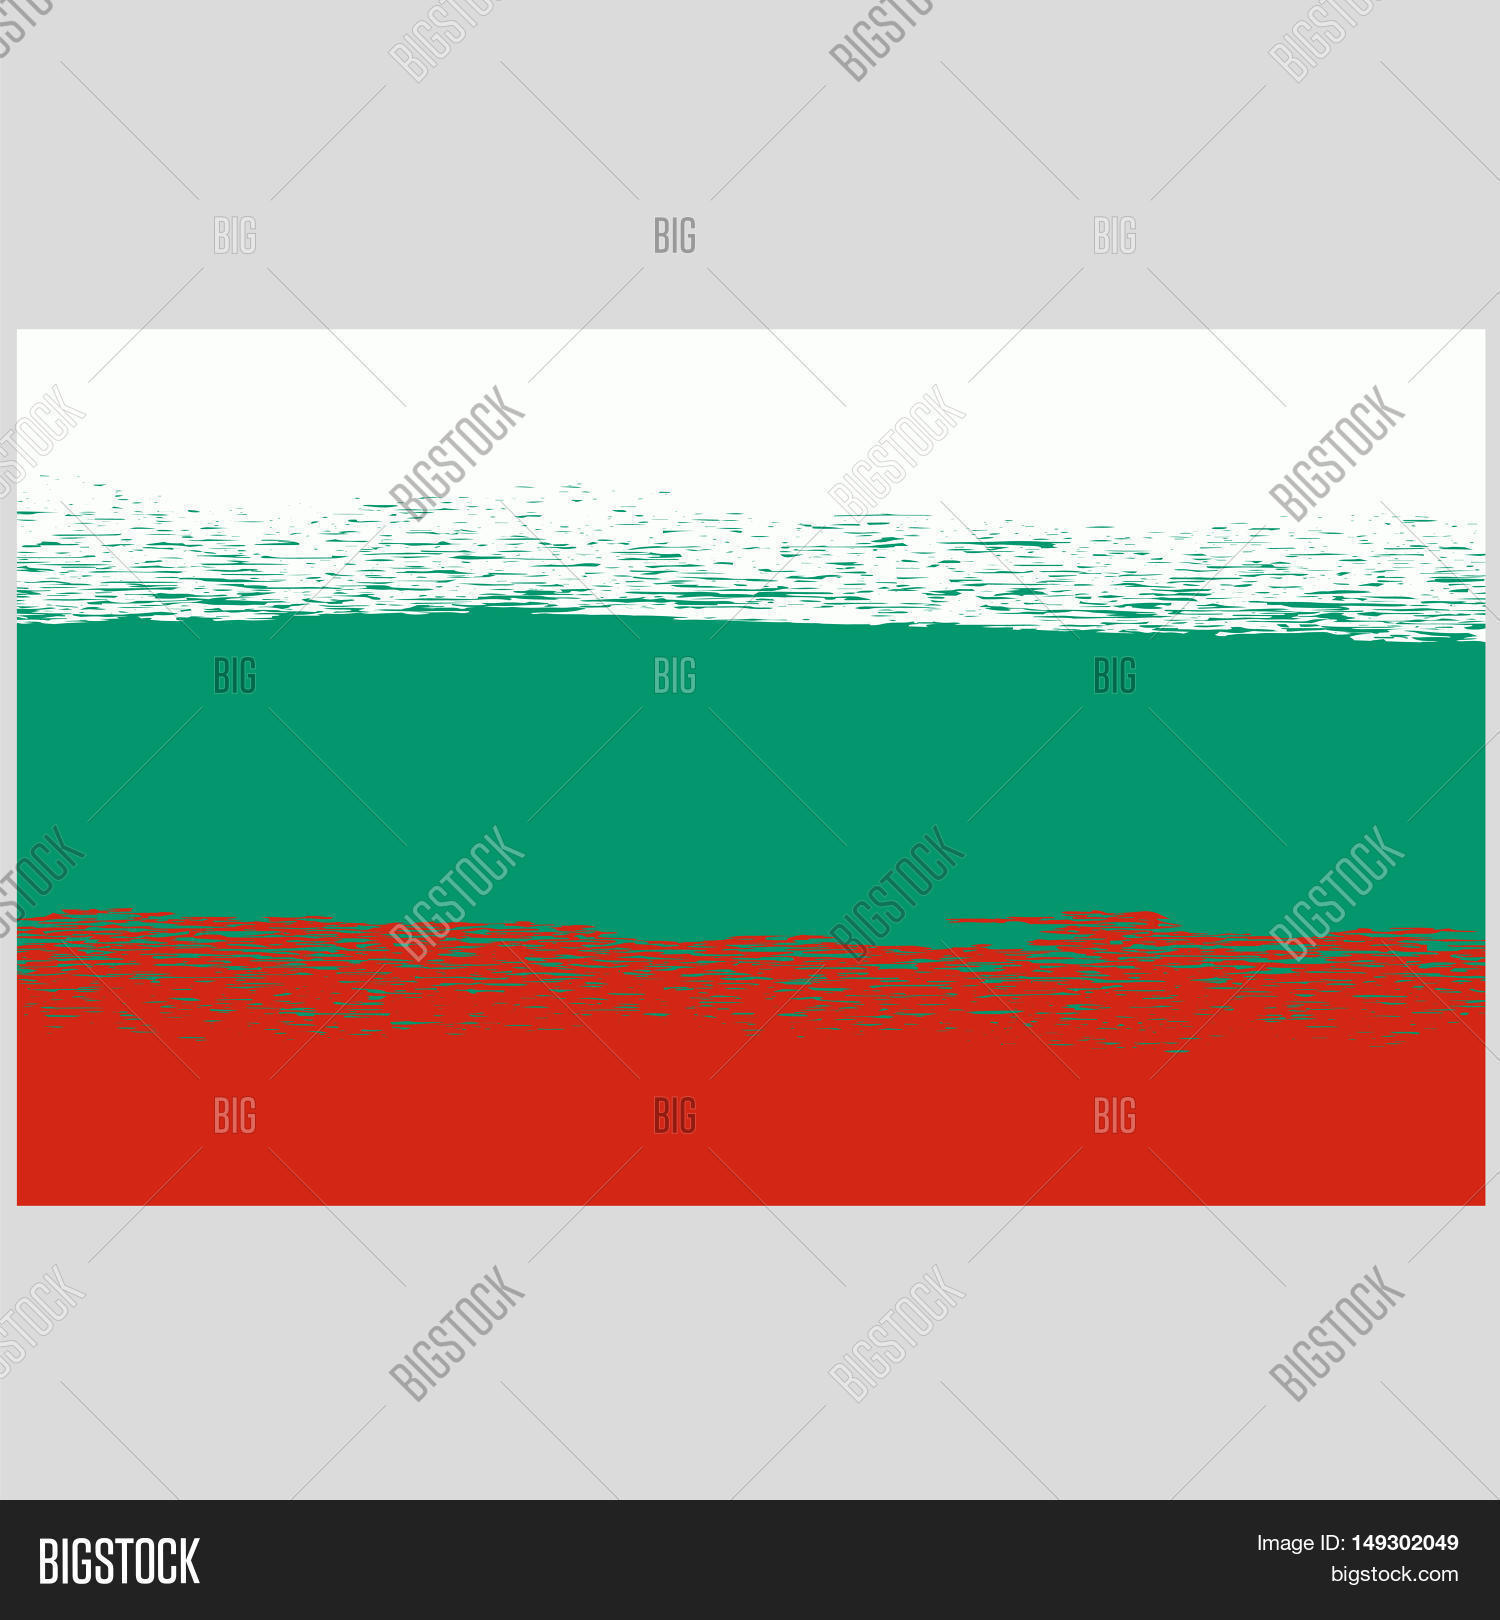 National Grunge Flag Bulgaria Image & Photo | Bigstock